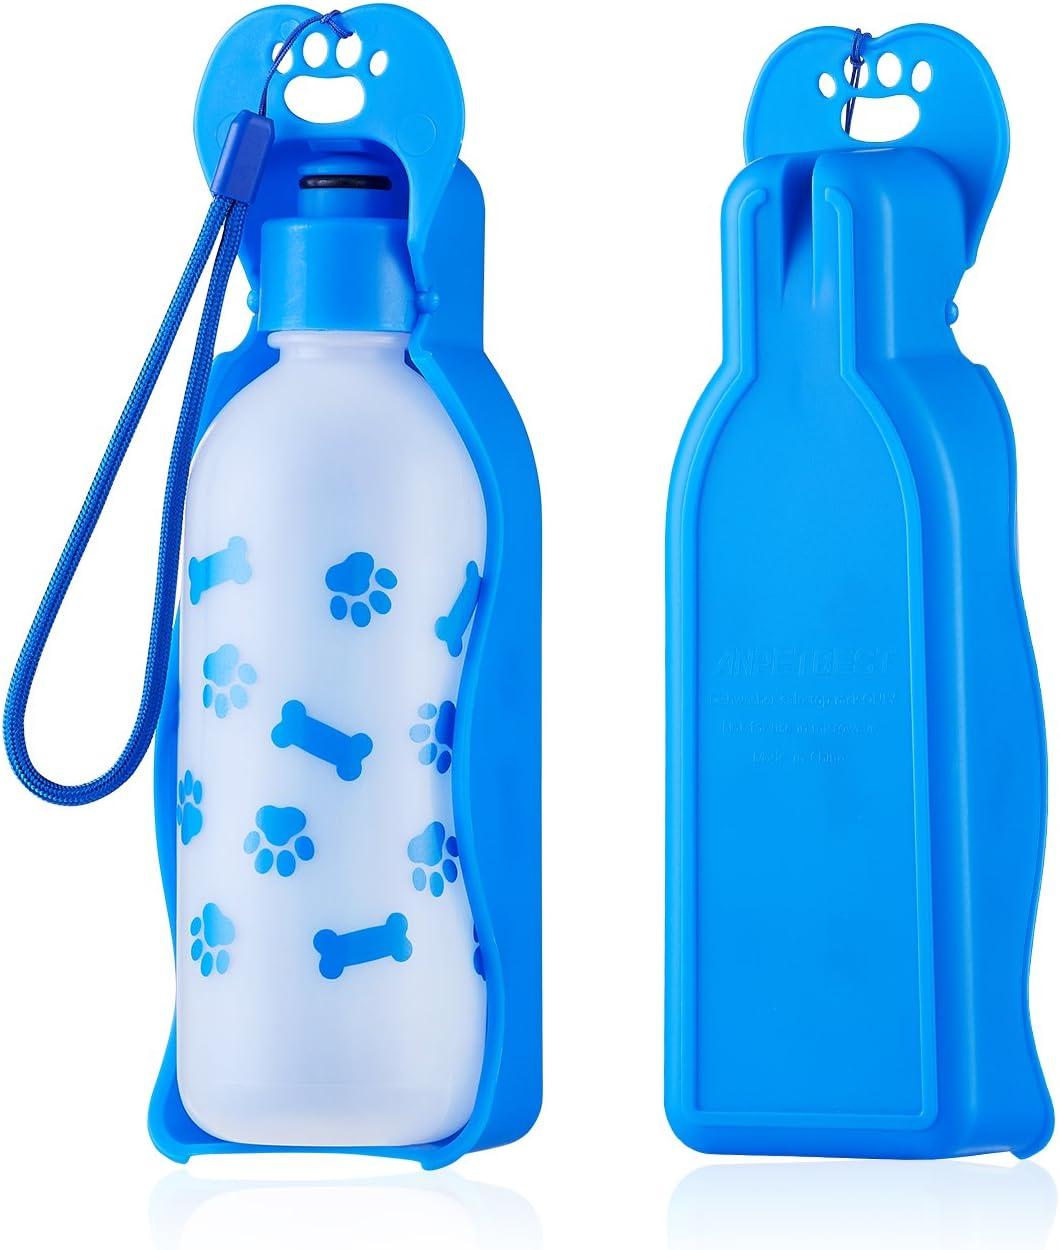 325ml botella de agua portátil para perro, Anpetbest Portátil botella de viaje para mascotas Bebedero para Perro y Gatos Bebedero de Viaje para Mascota